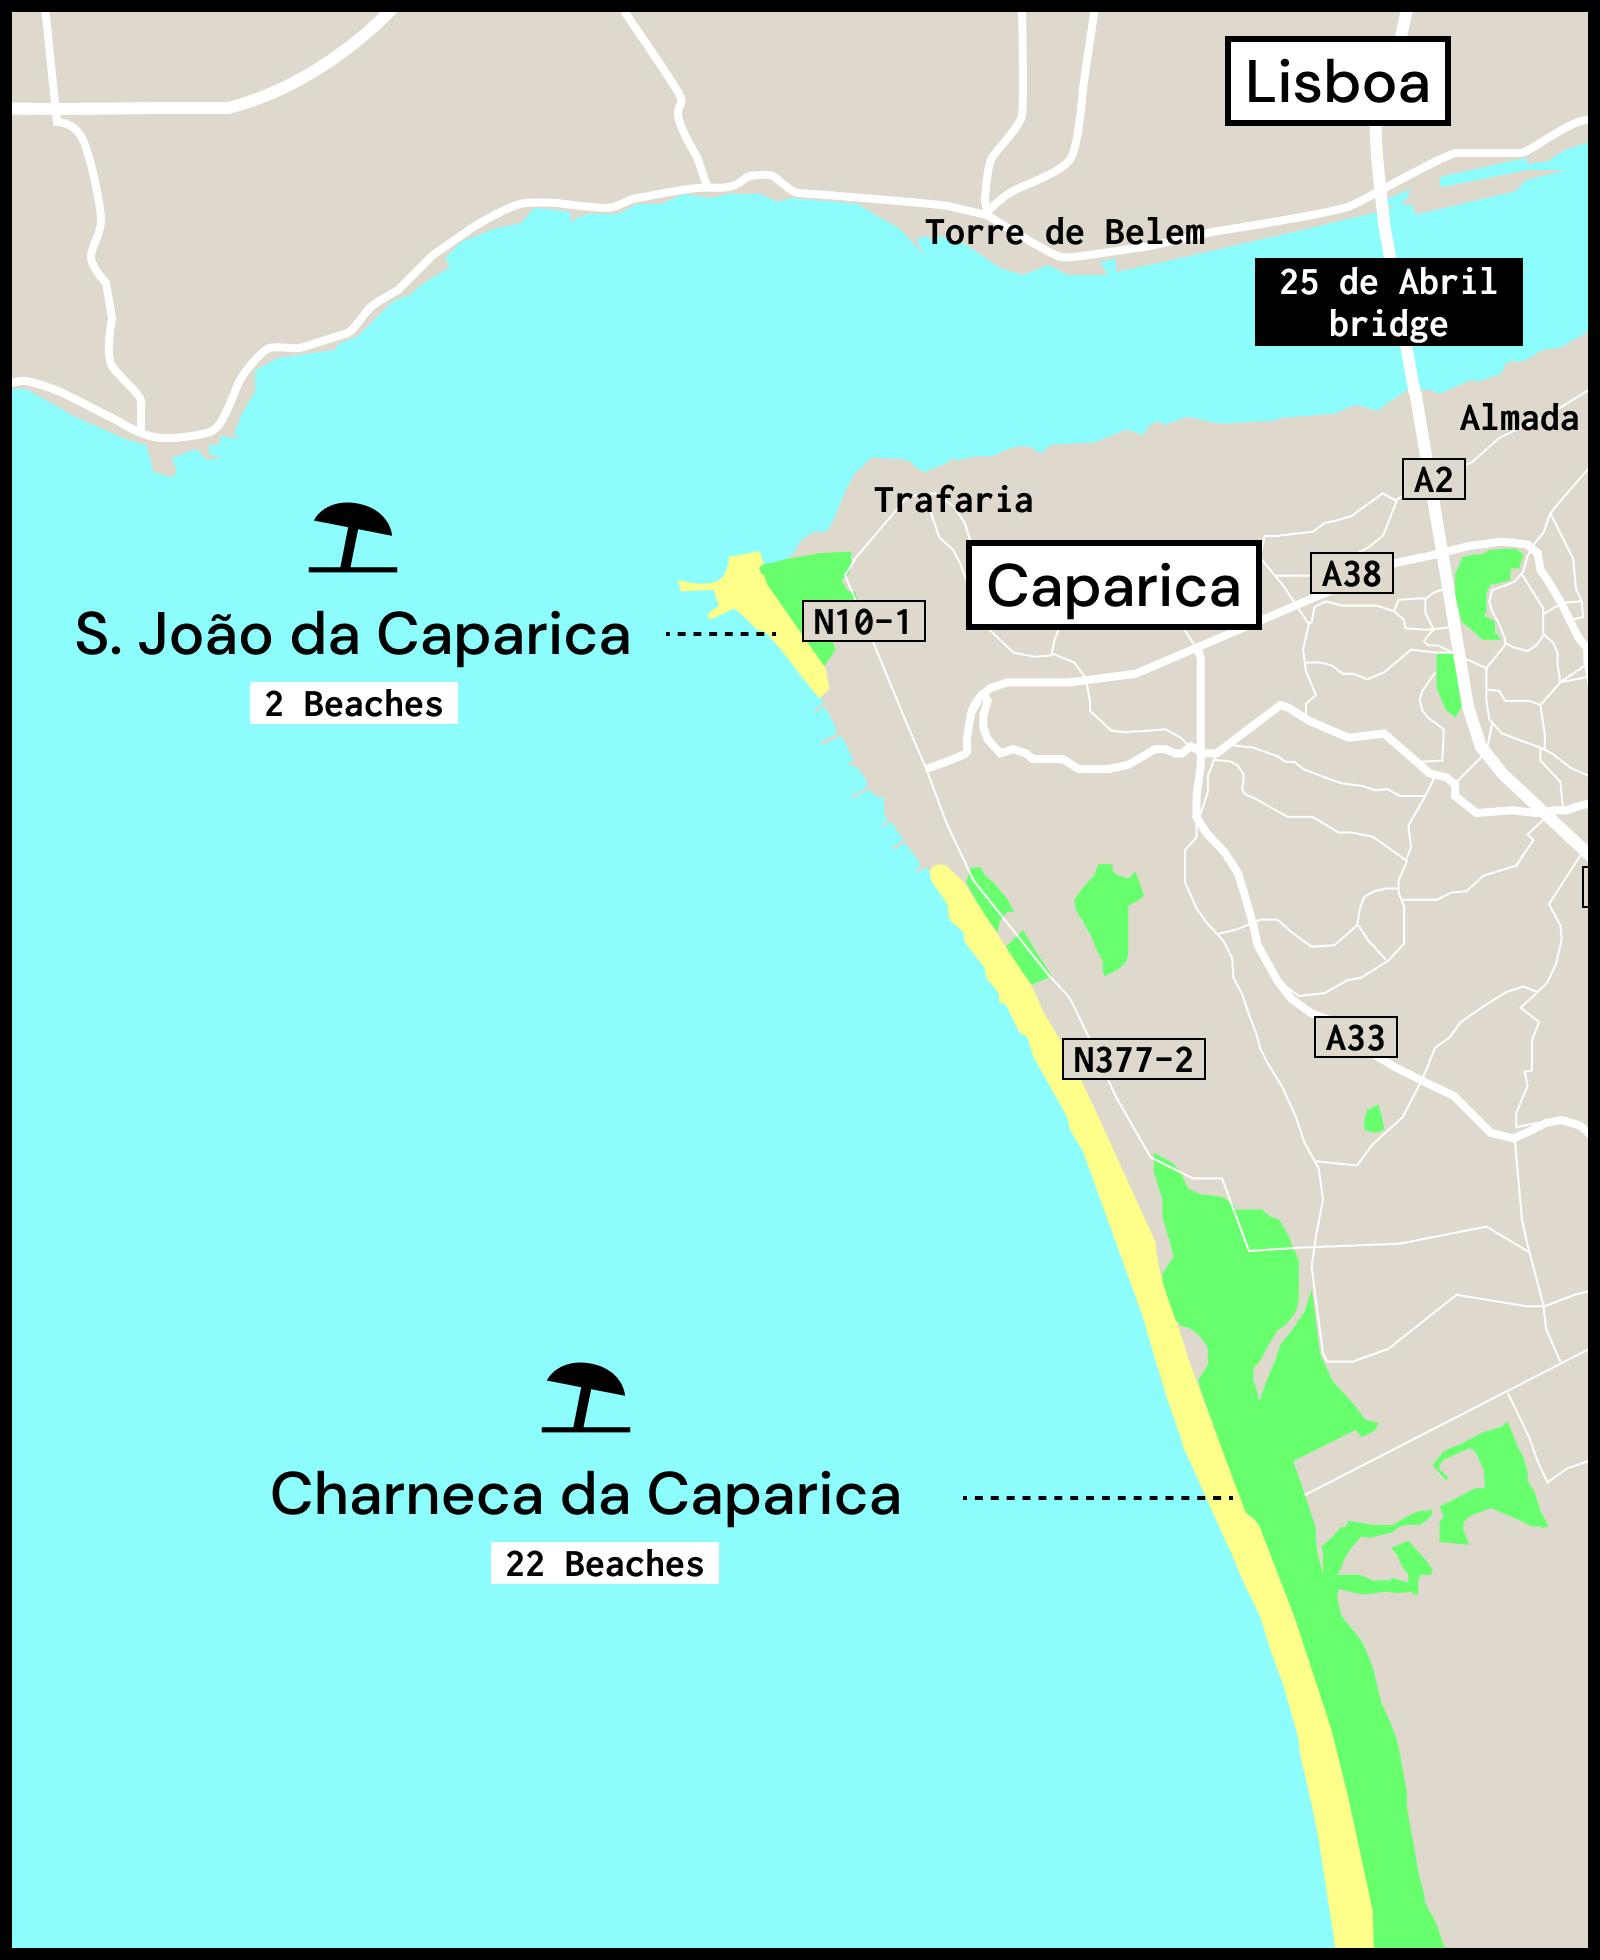 Map of the Costa da Caparica beaches